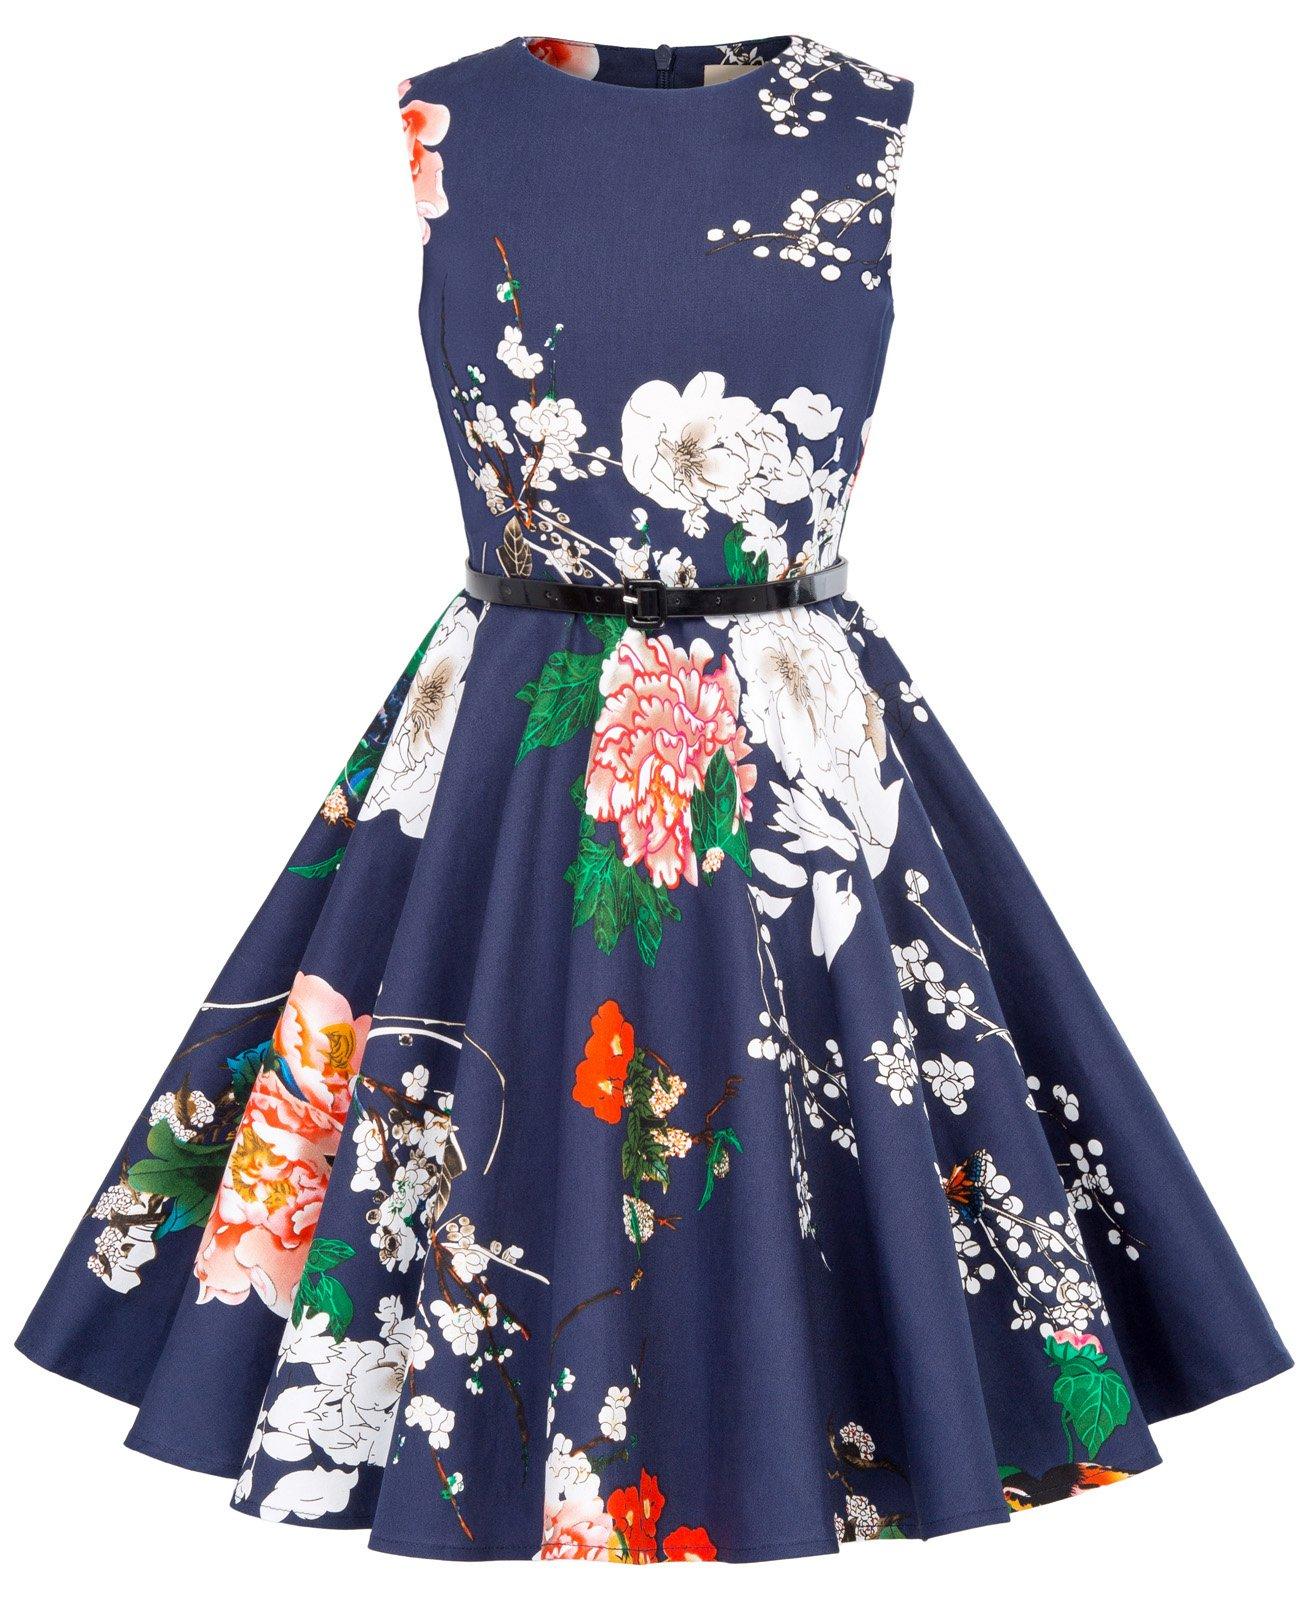 24220c9bd32 Kate Kasin Girls Sleeveless Vintage Print Swing Party Dresses 6-15 Years